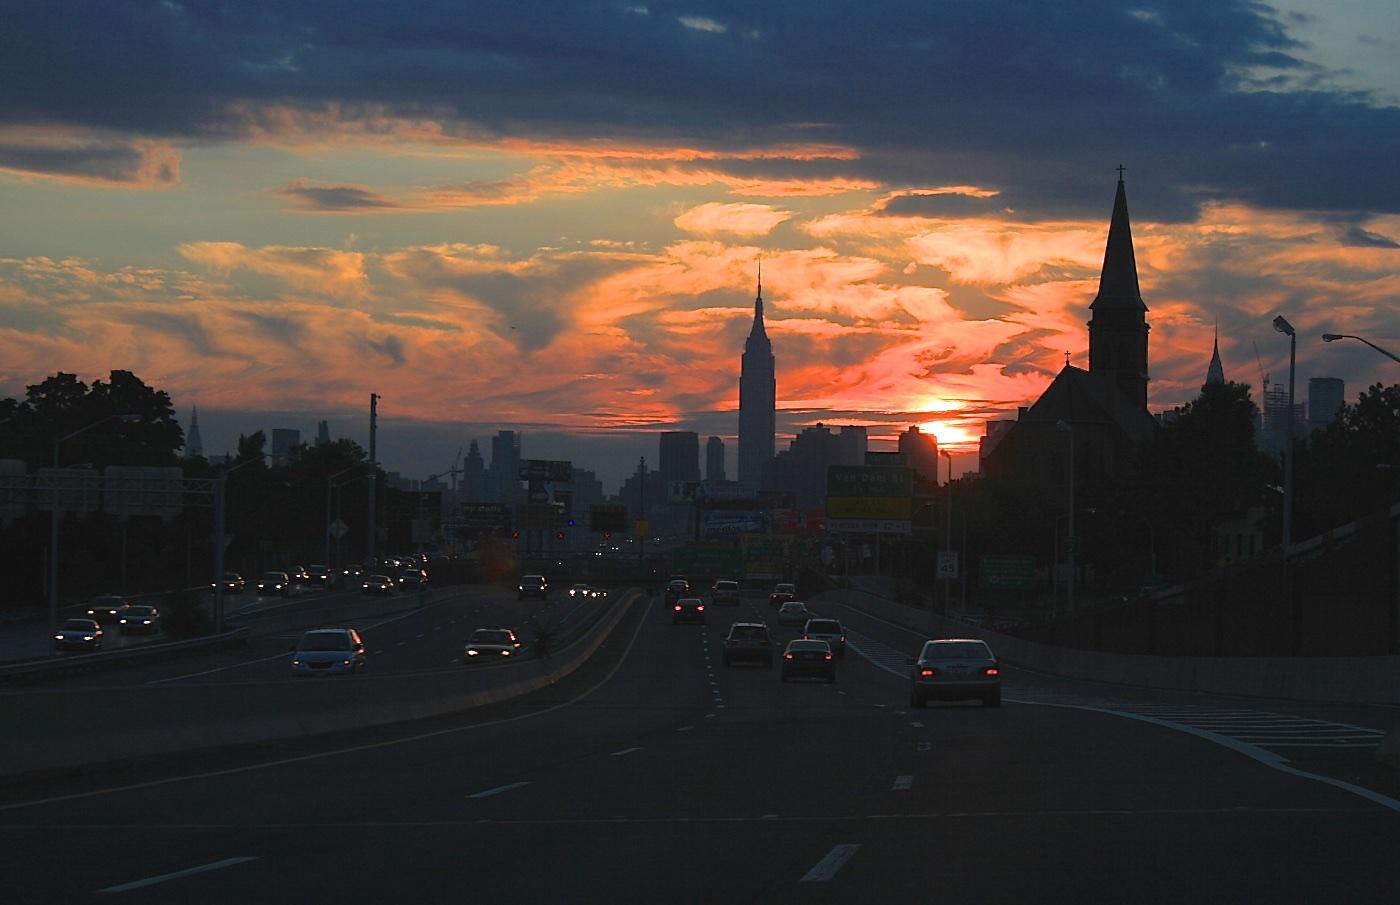 Sunset on the LIE